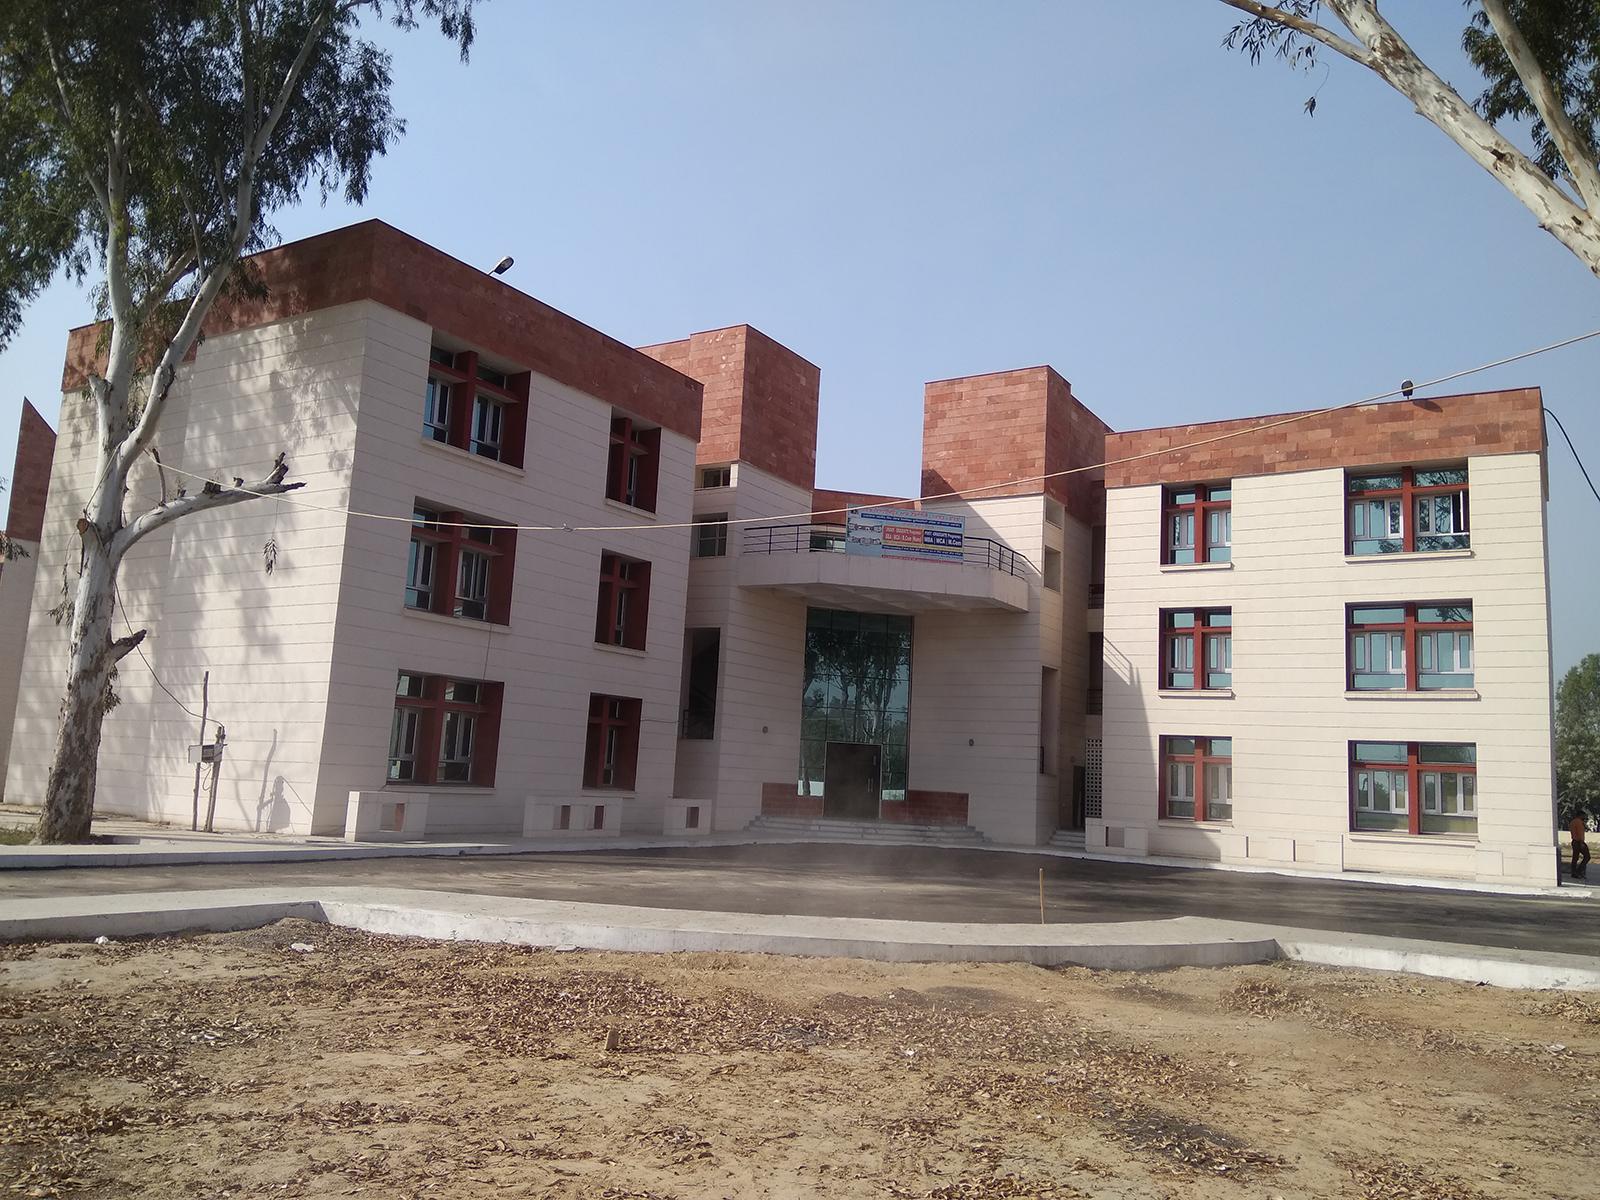 Punjab Institute of Technology, Nandgarh Image